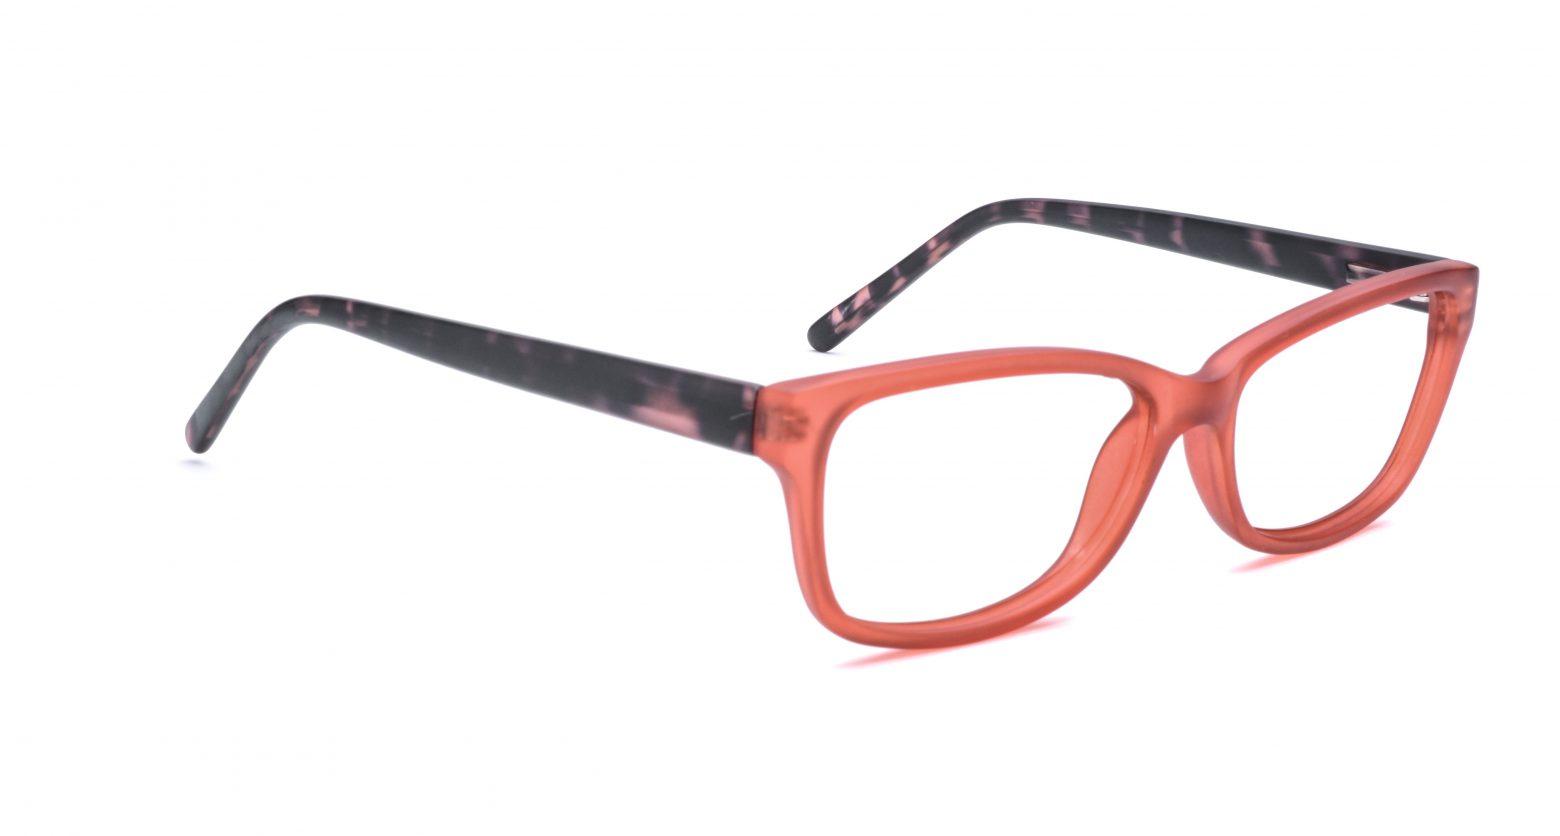 Winter Spree Marvel Optics Prescription Eyeglasses  RA269-1-2